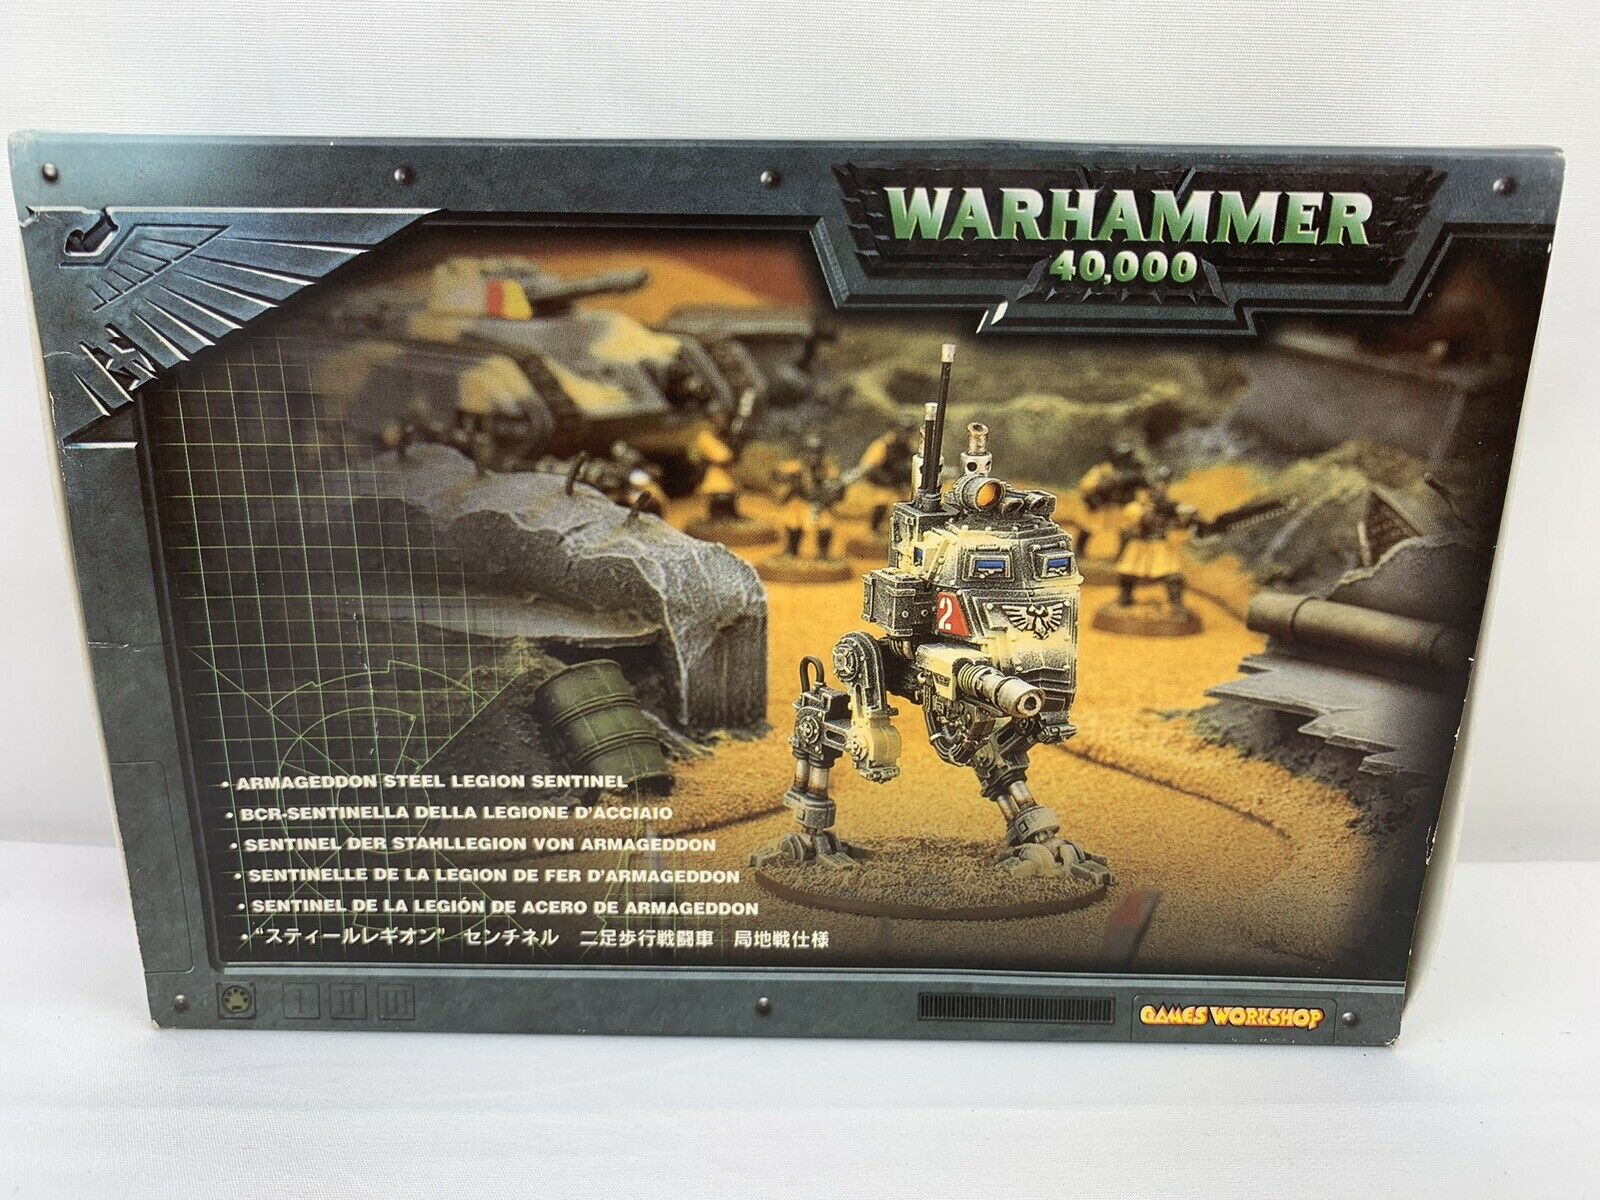 Warhammer 40k Armageddon Steel Legion Sentinel Metal & Plastic Miniature